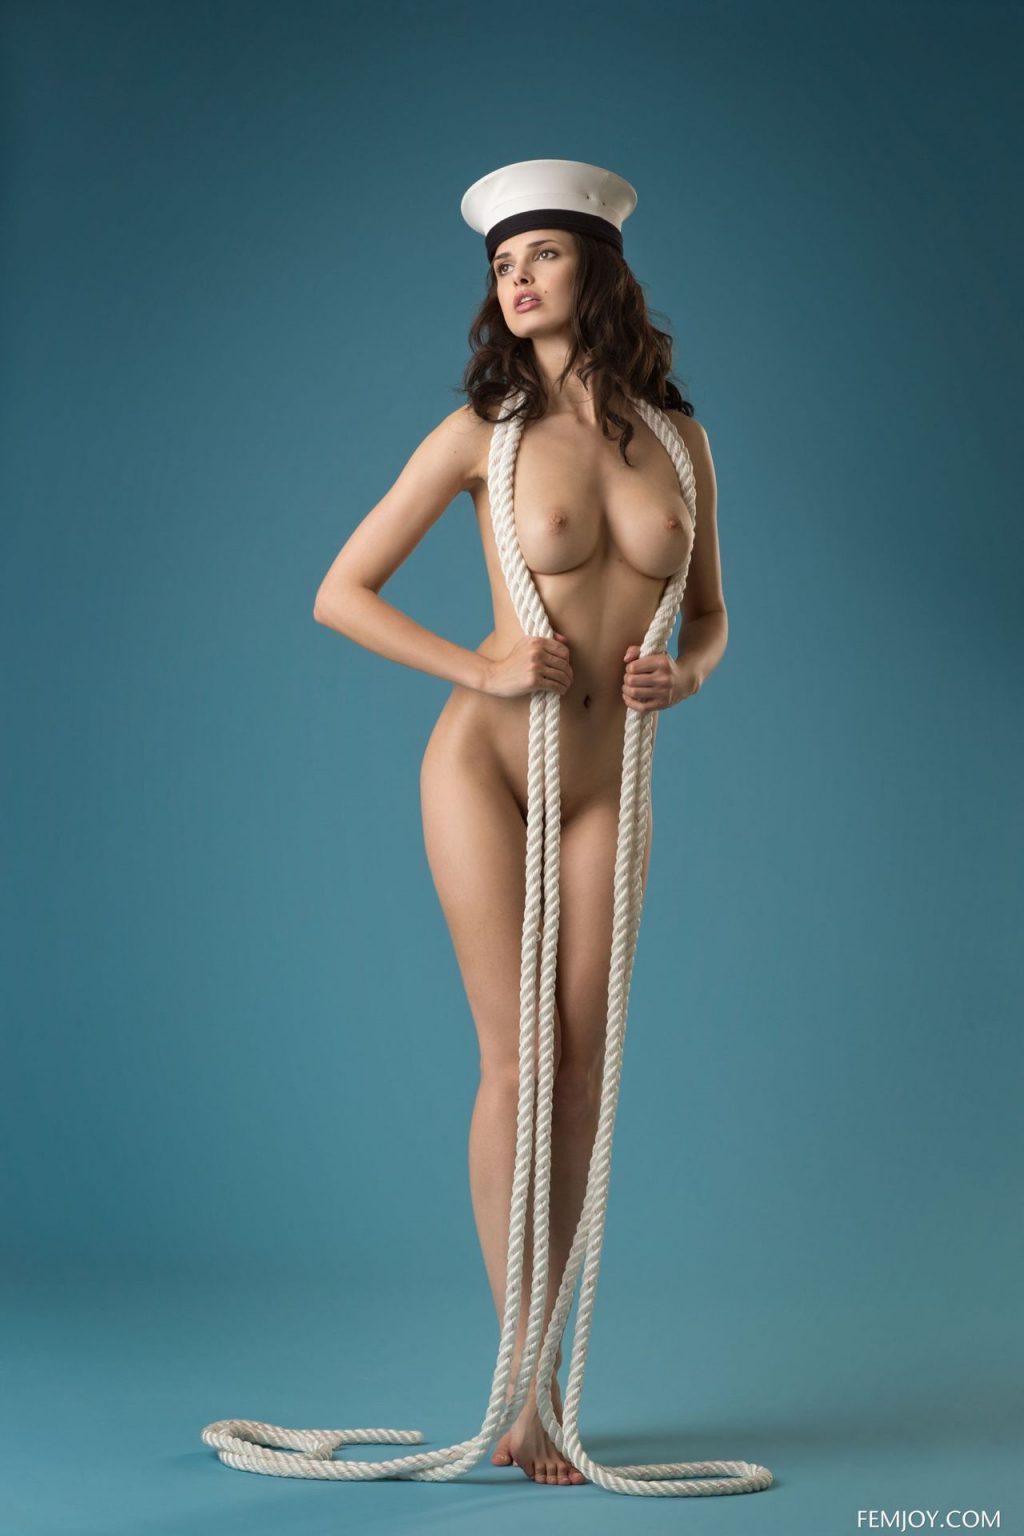 Zoi Gorman Nude – Throw Me A Rope (35 Photos)